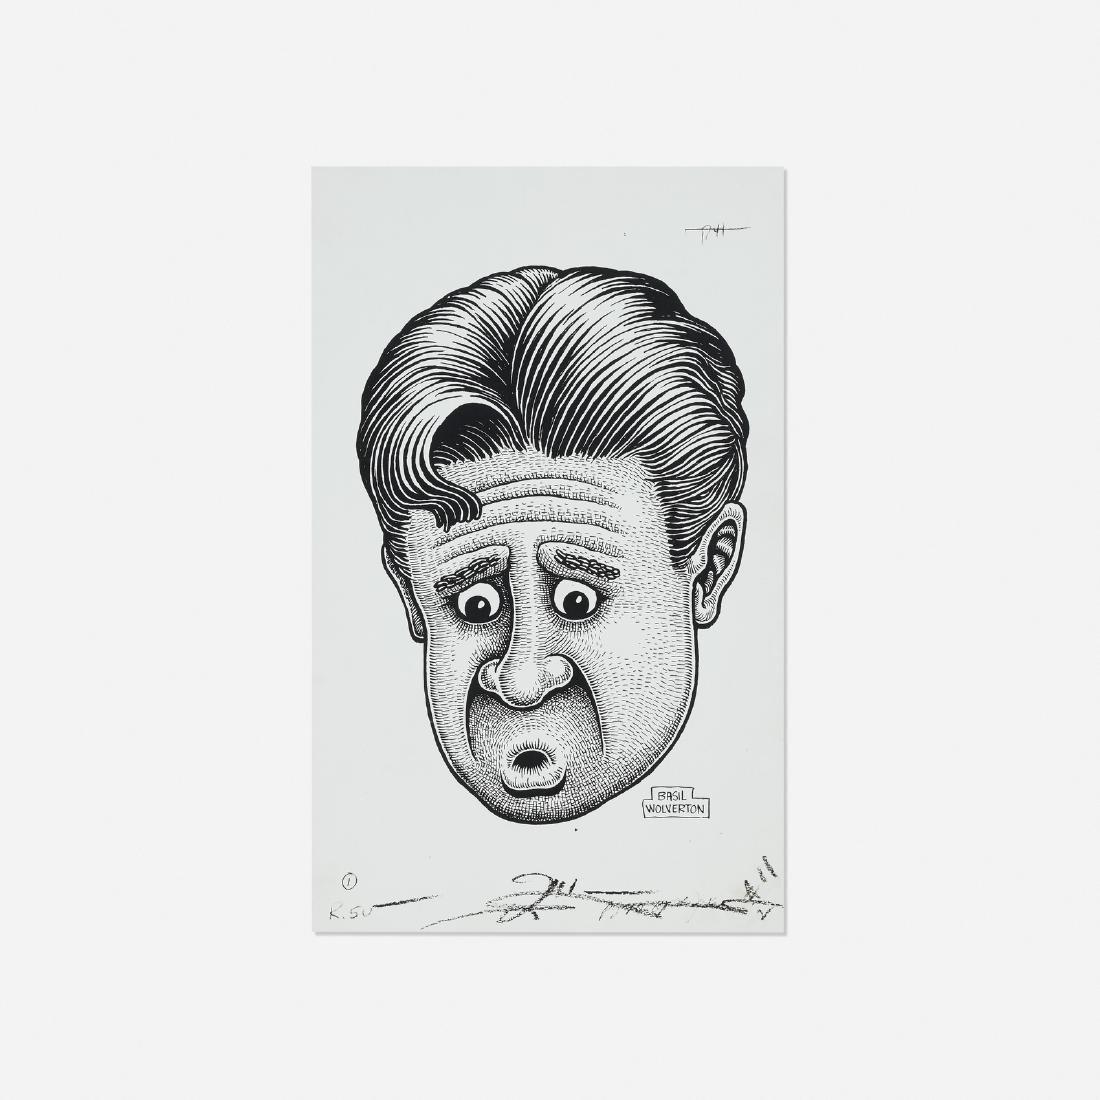 Basil Wolverton, Untitled